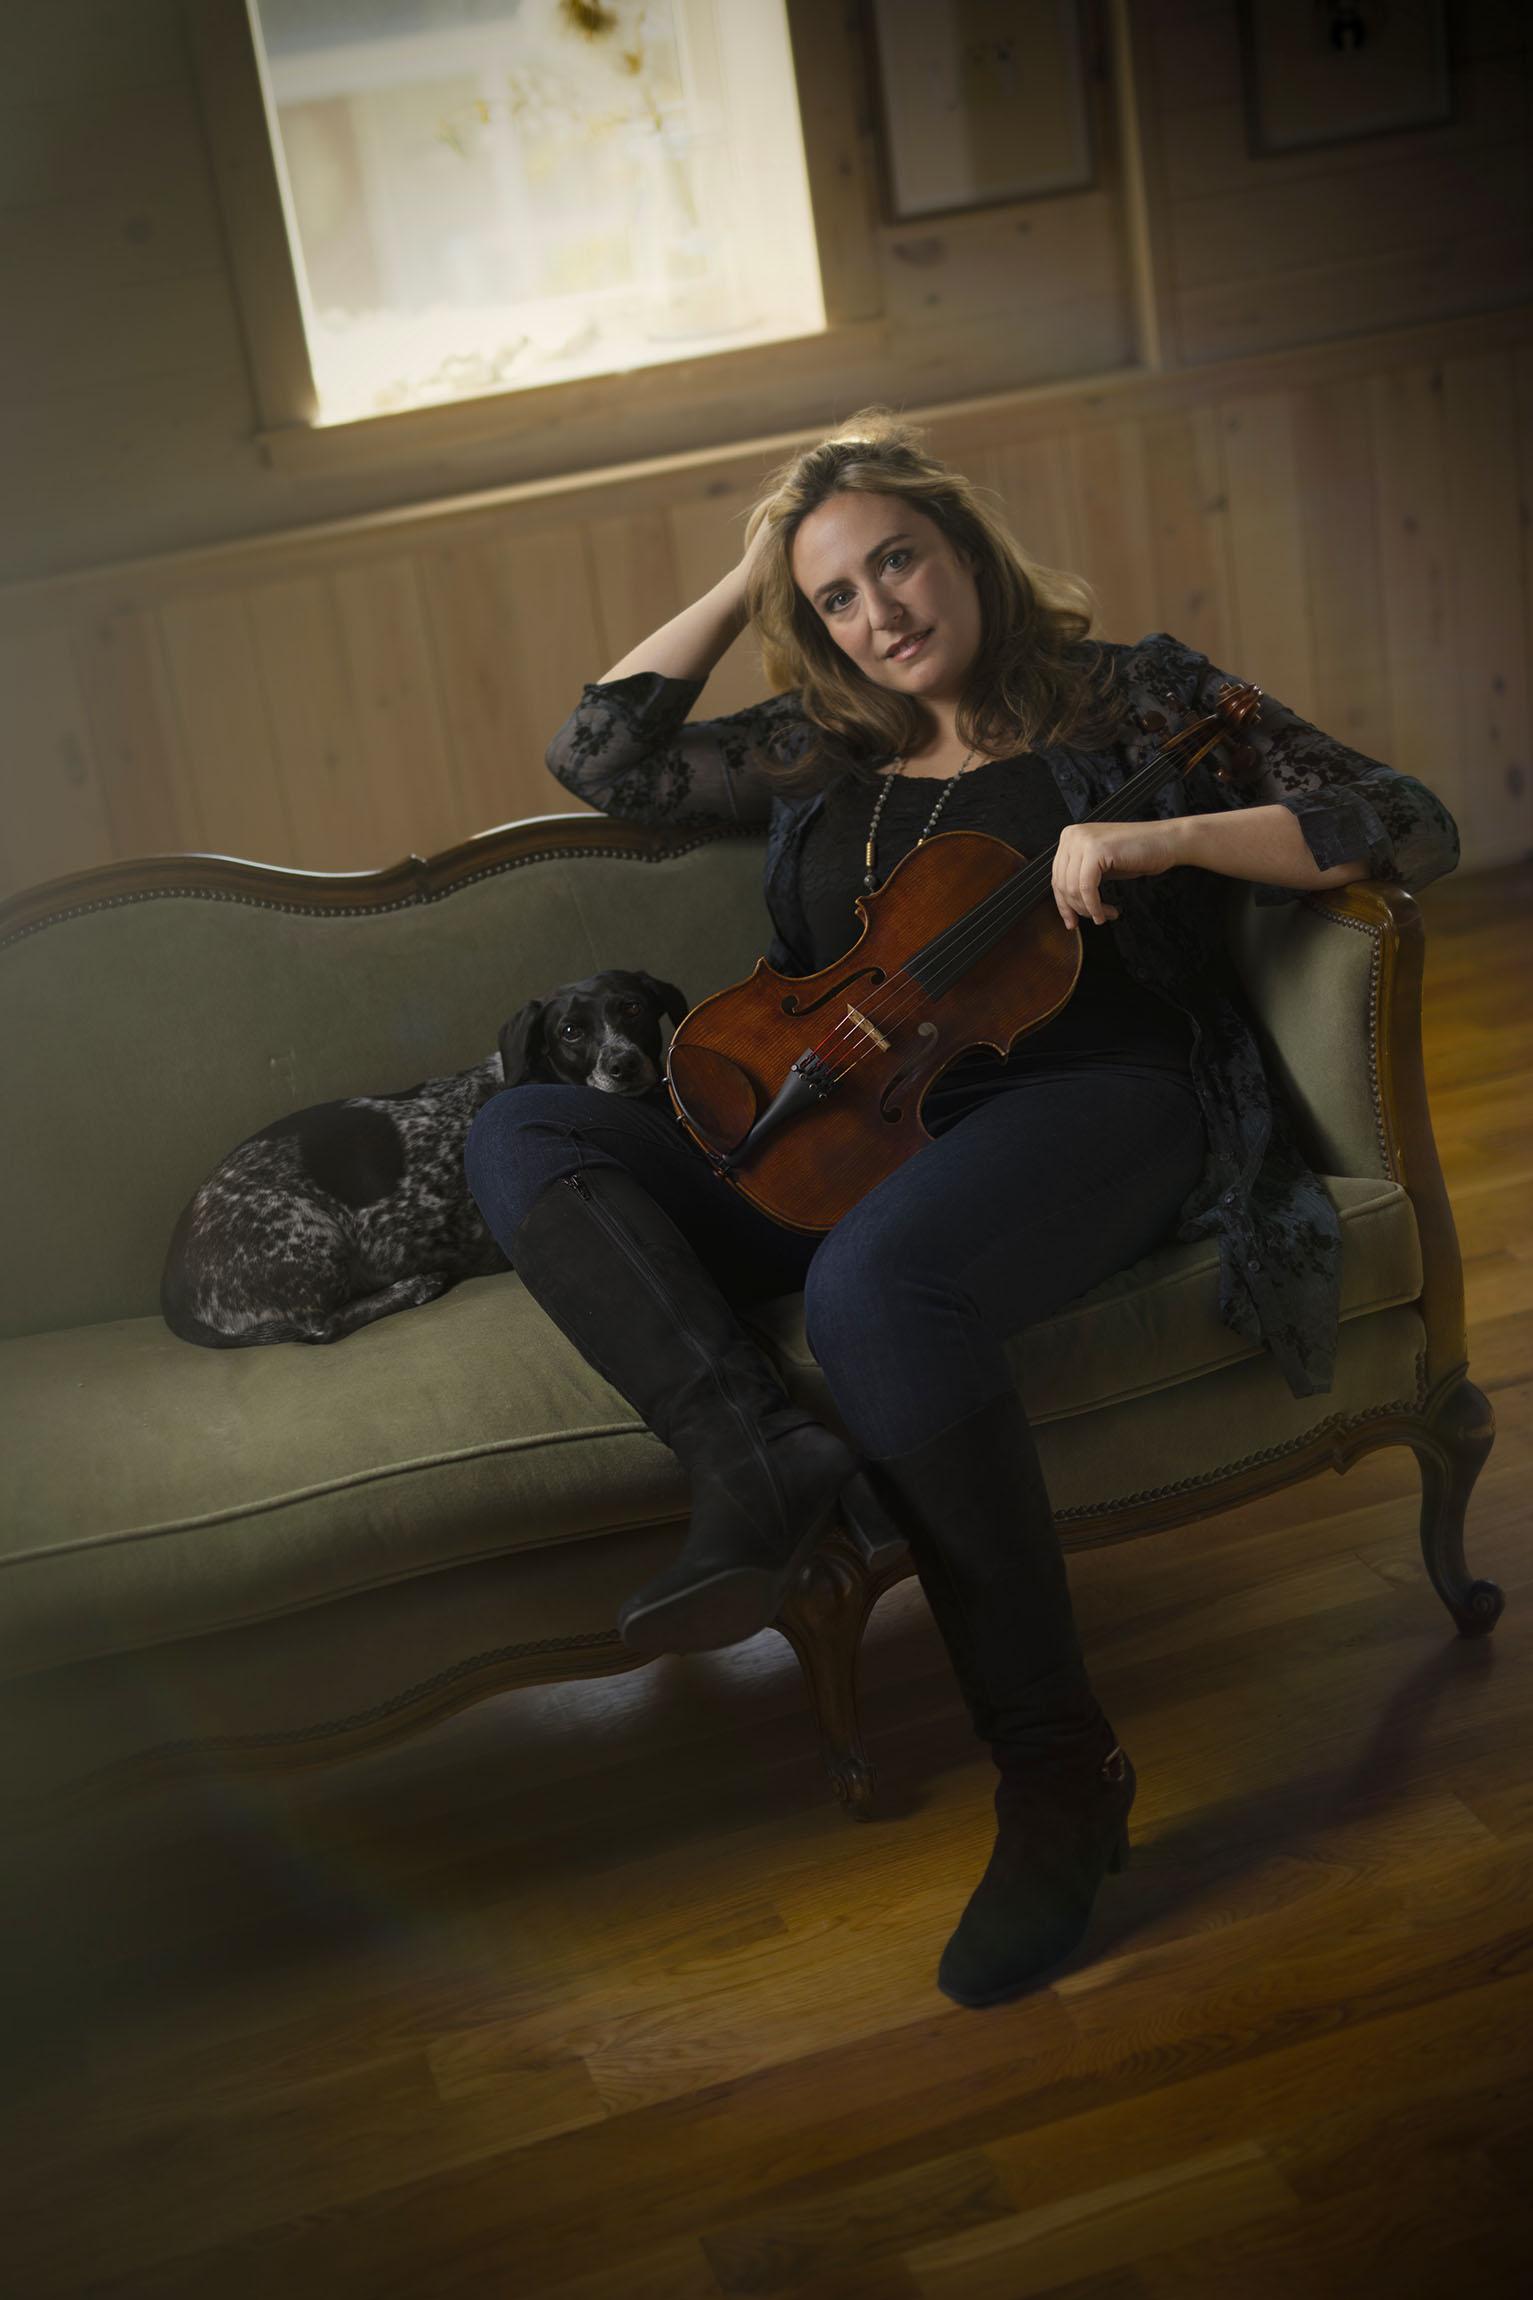 Portrait of Kansas City Symphony's principal violist, Christine Grossman.